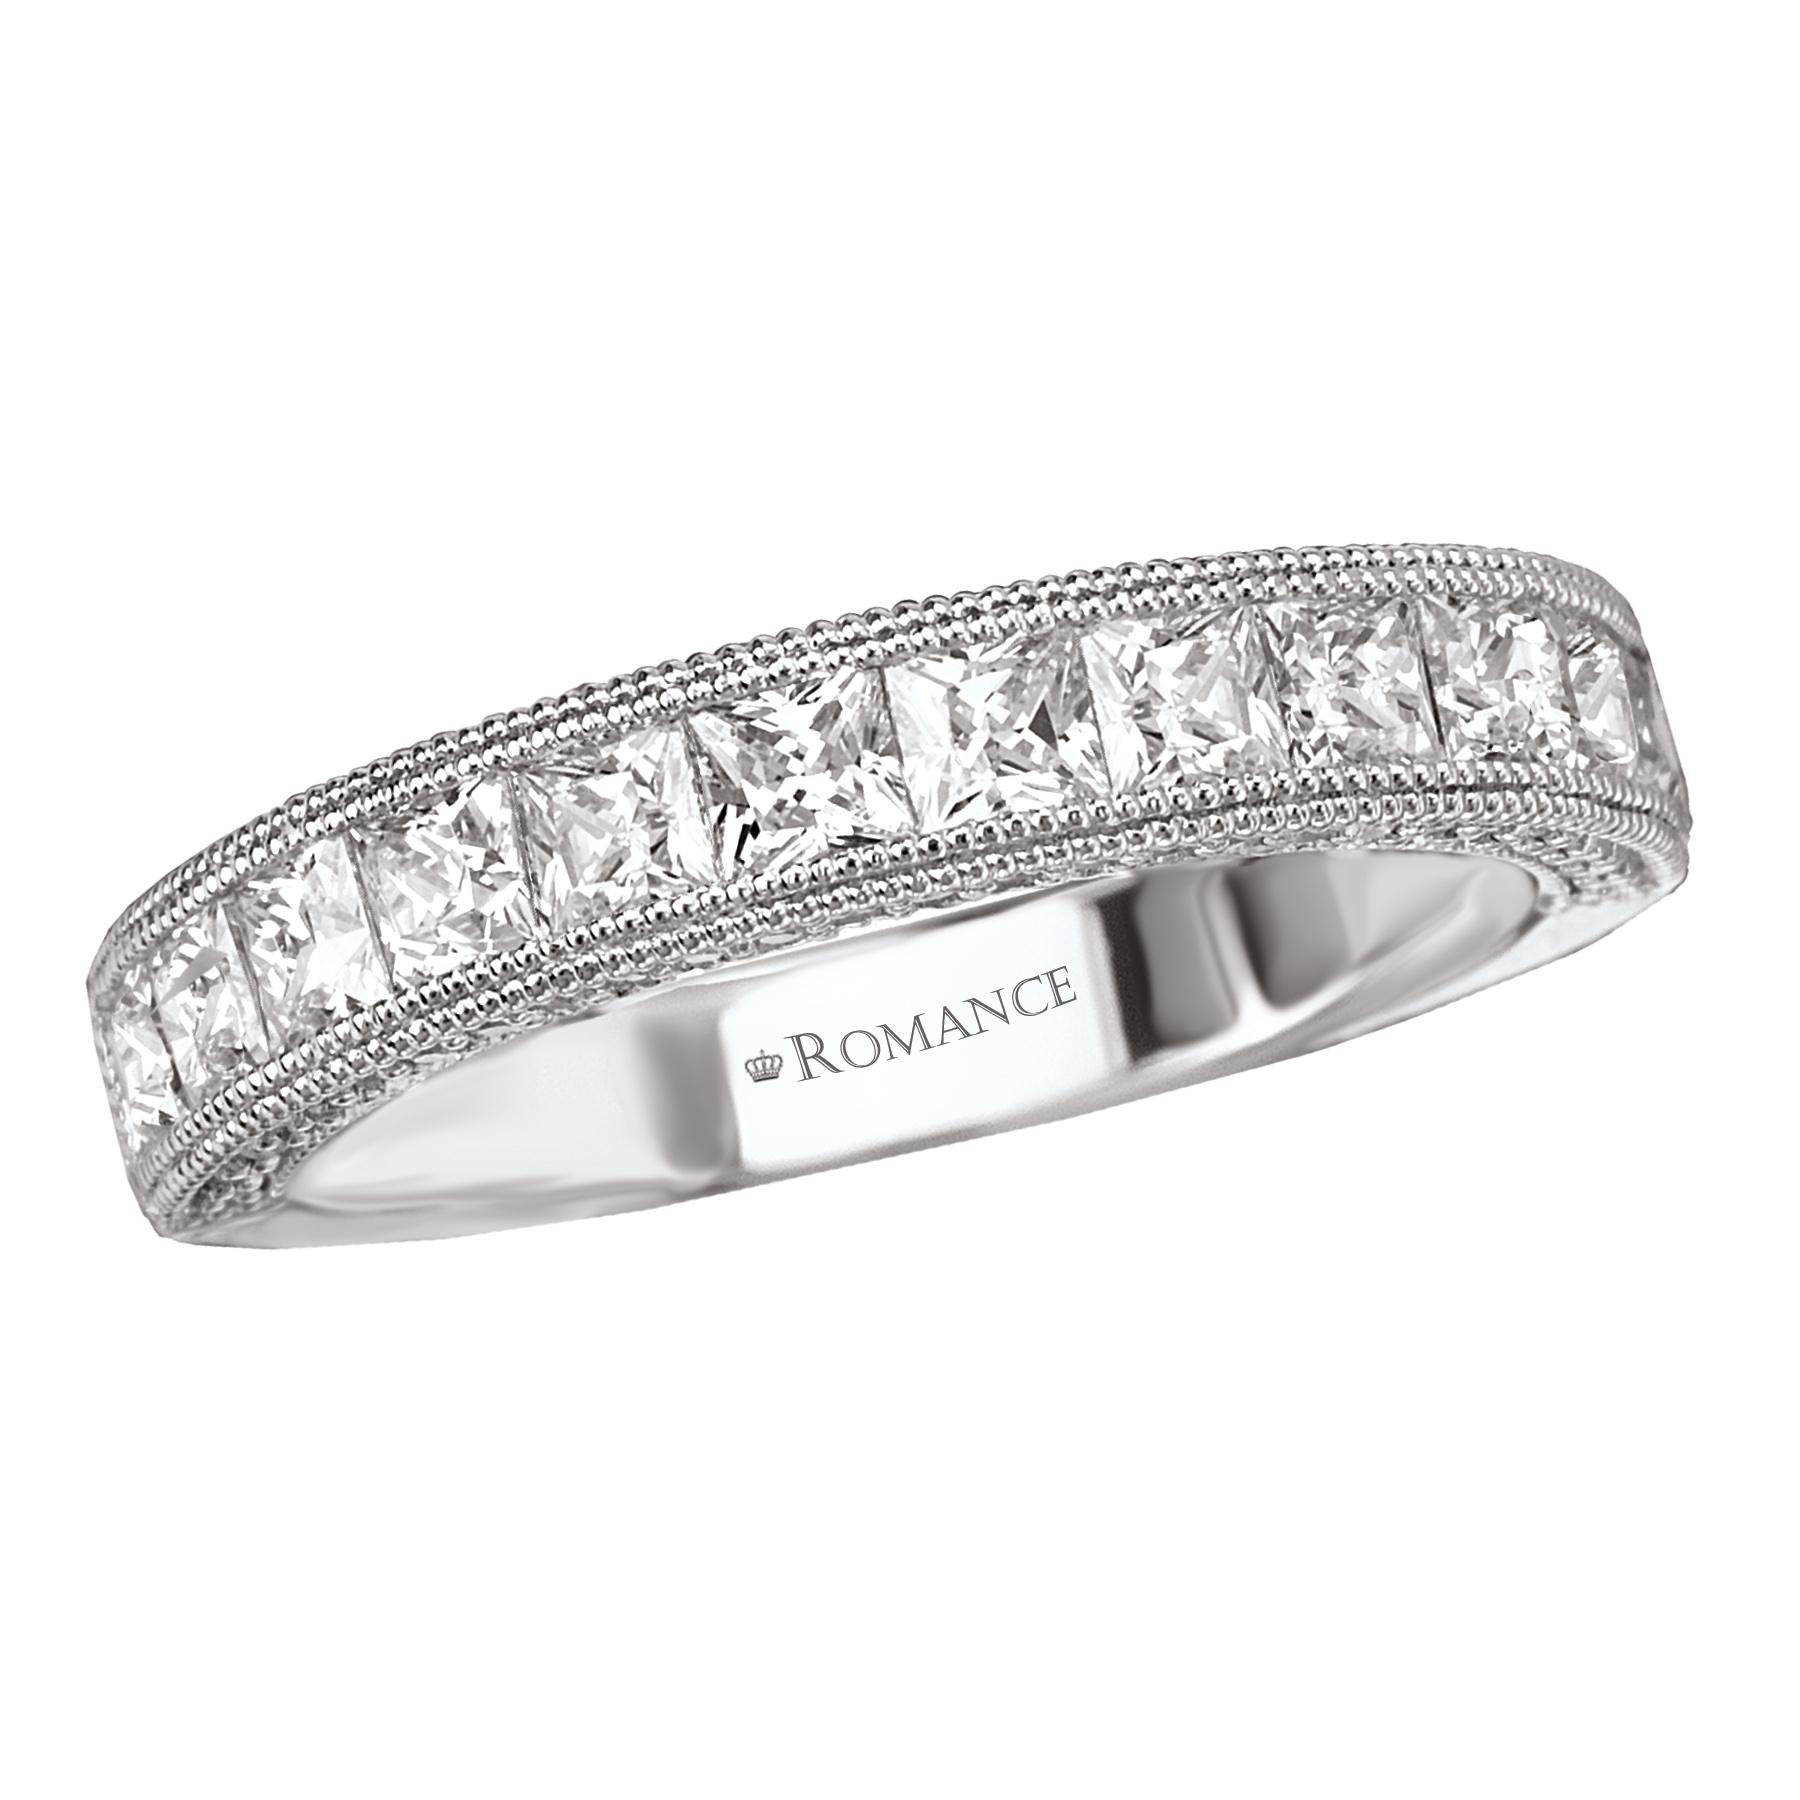 Romance Wedding Bands 117409-150W product image